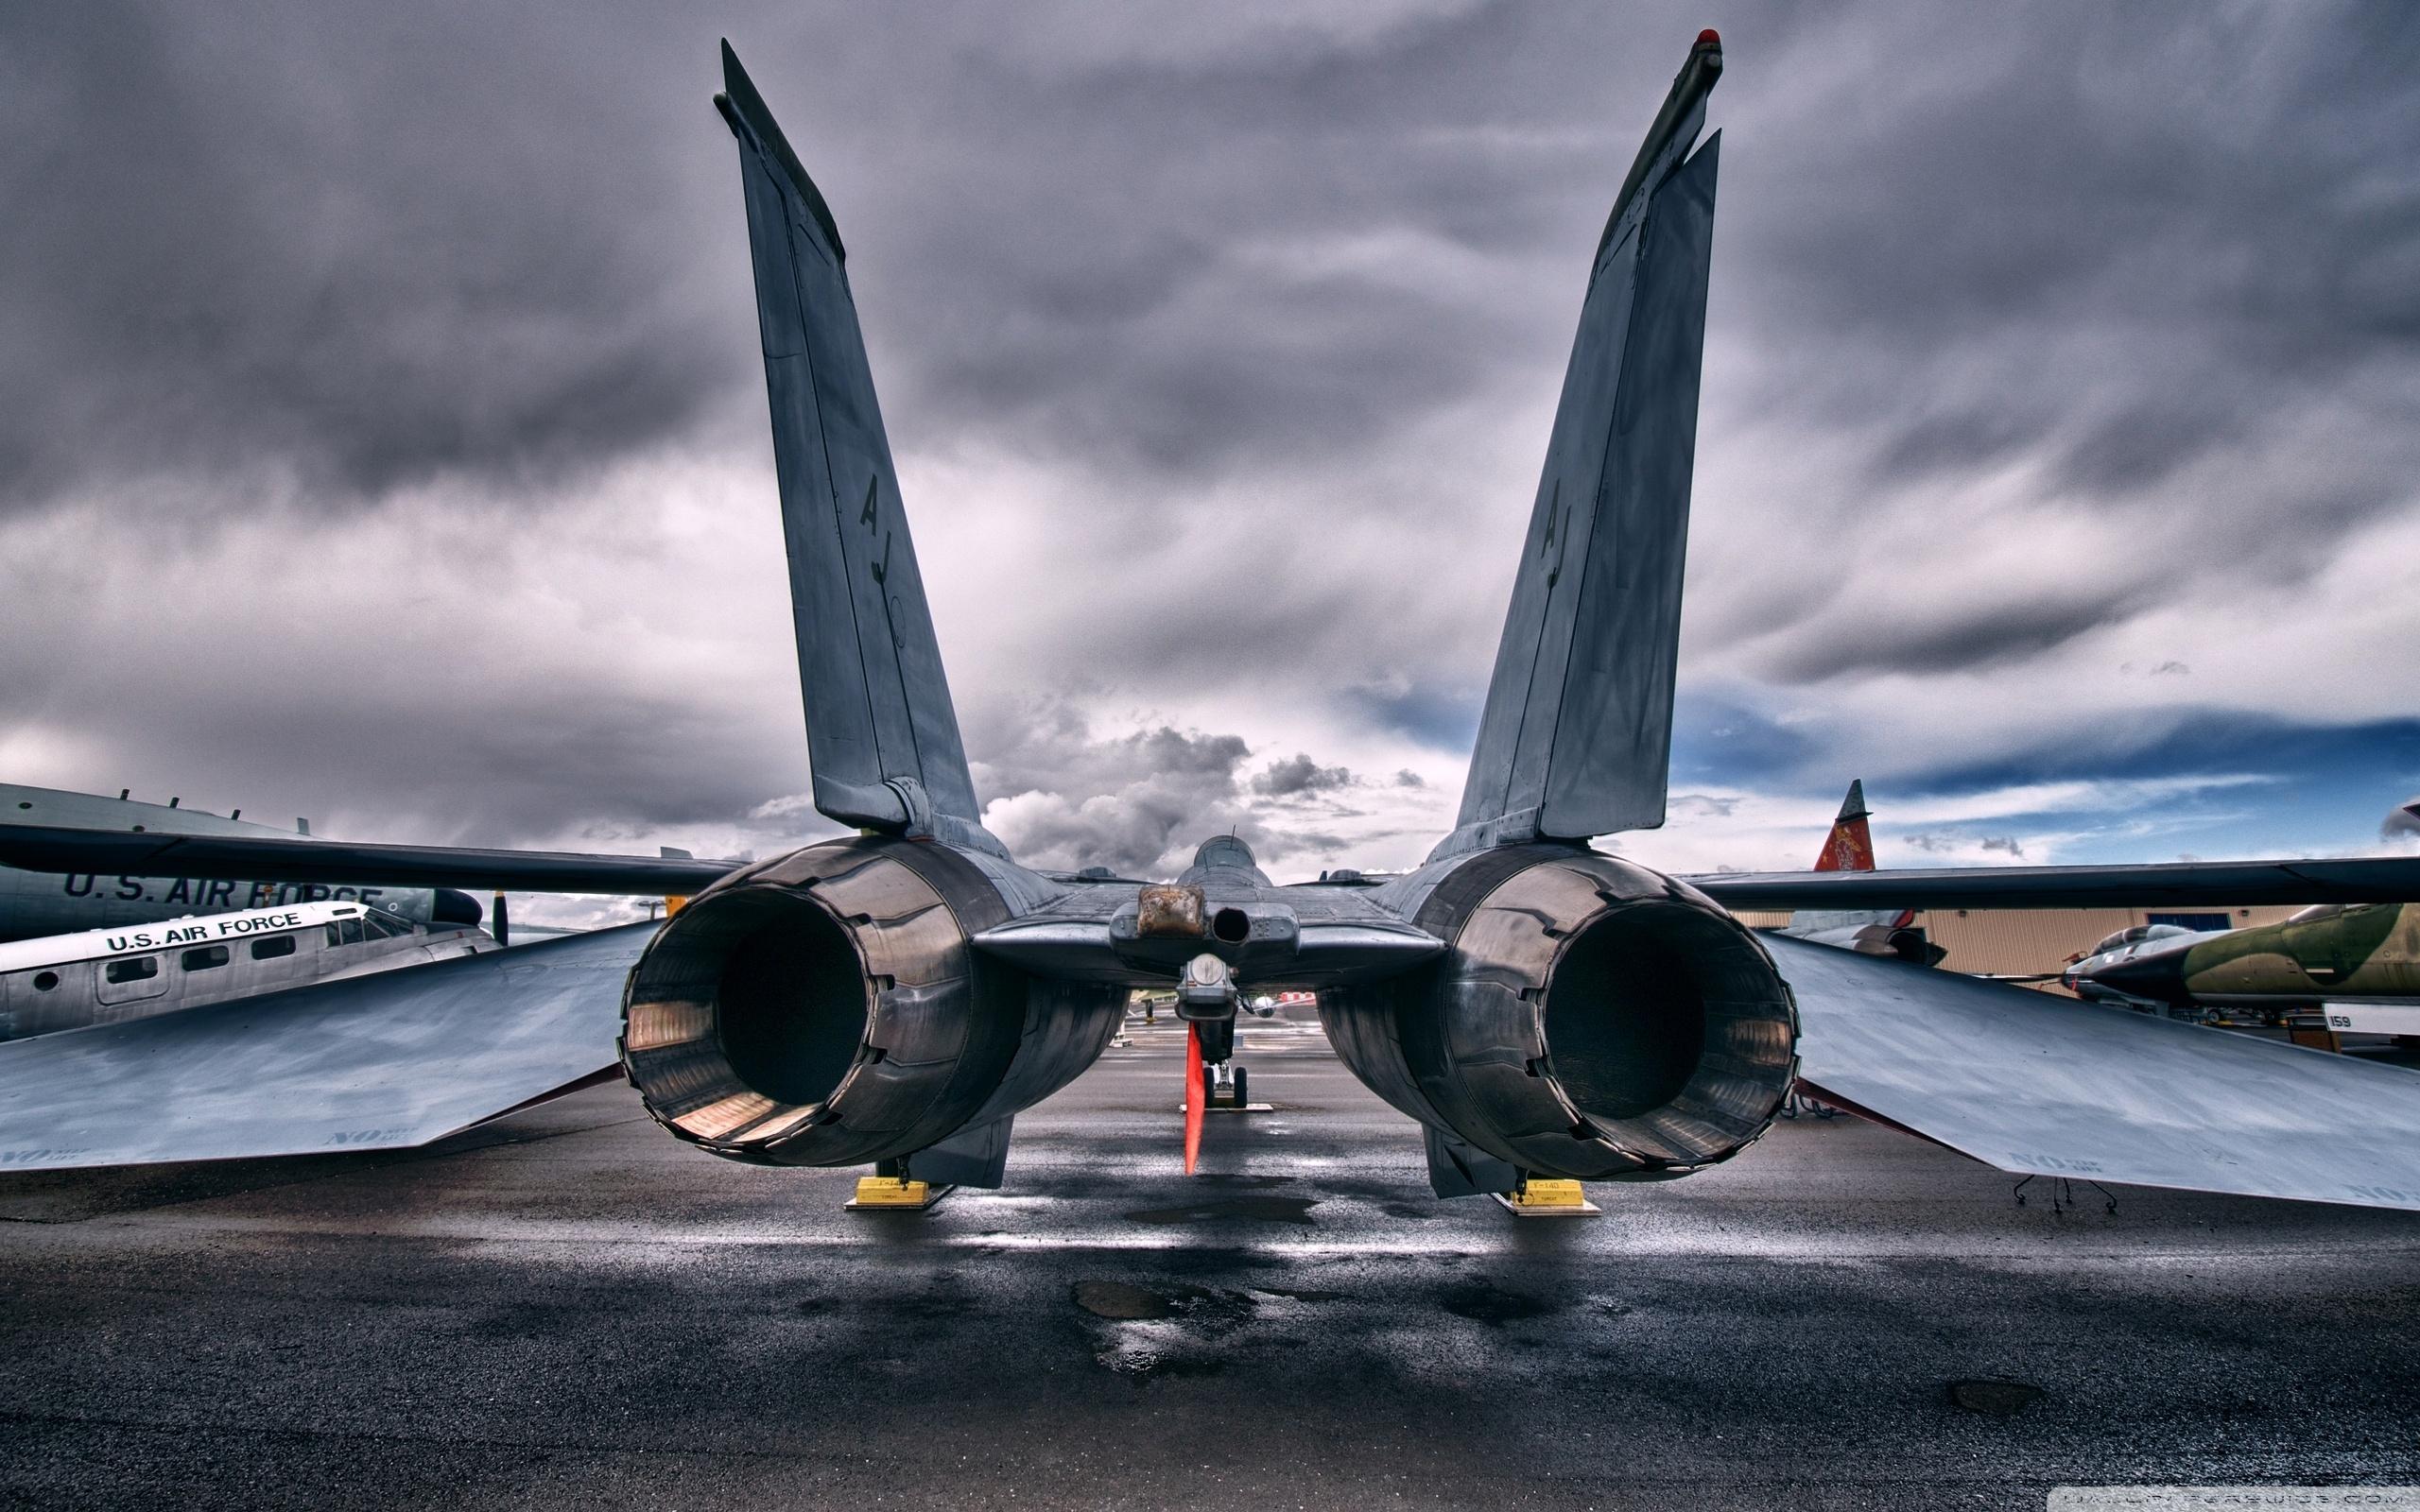 us air force ❤ 4k hd desktop wallpaper for 4k ultra hd tv • tablet